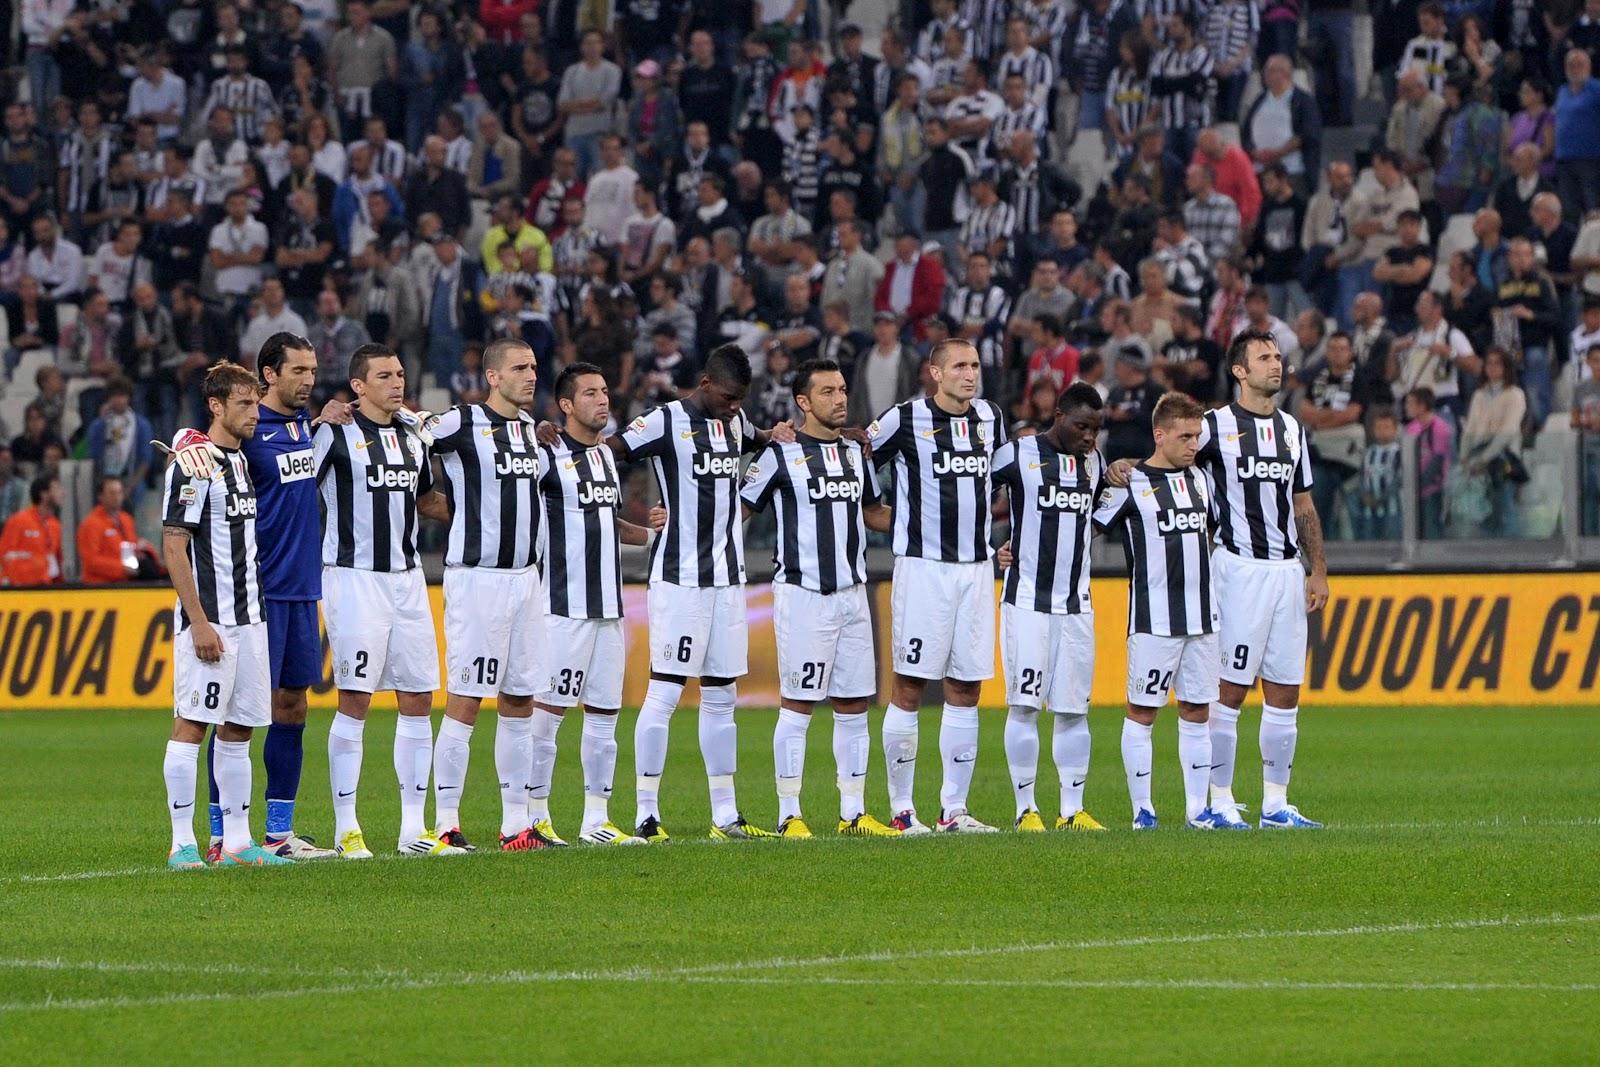 Diretta Streaming Genoa Juventus Gratis Partita Live Oggi Posticipo Serie A Baritalia News